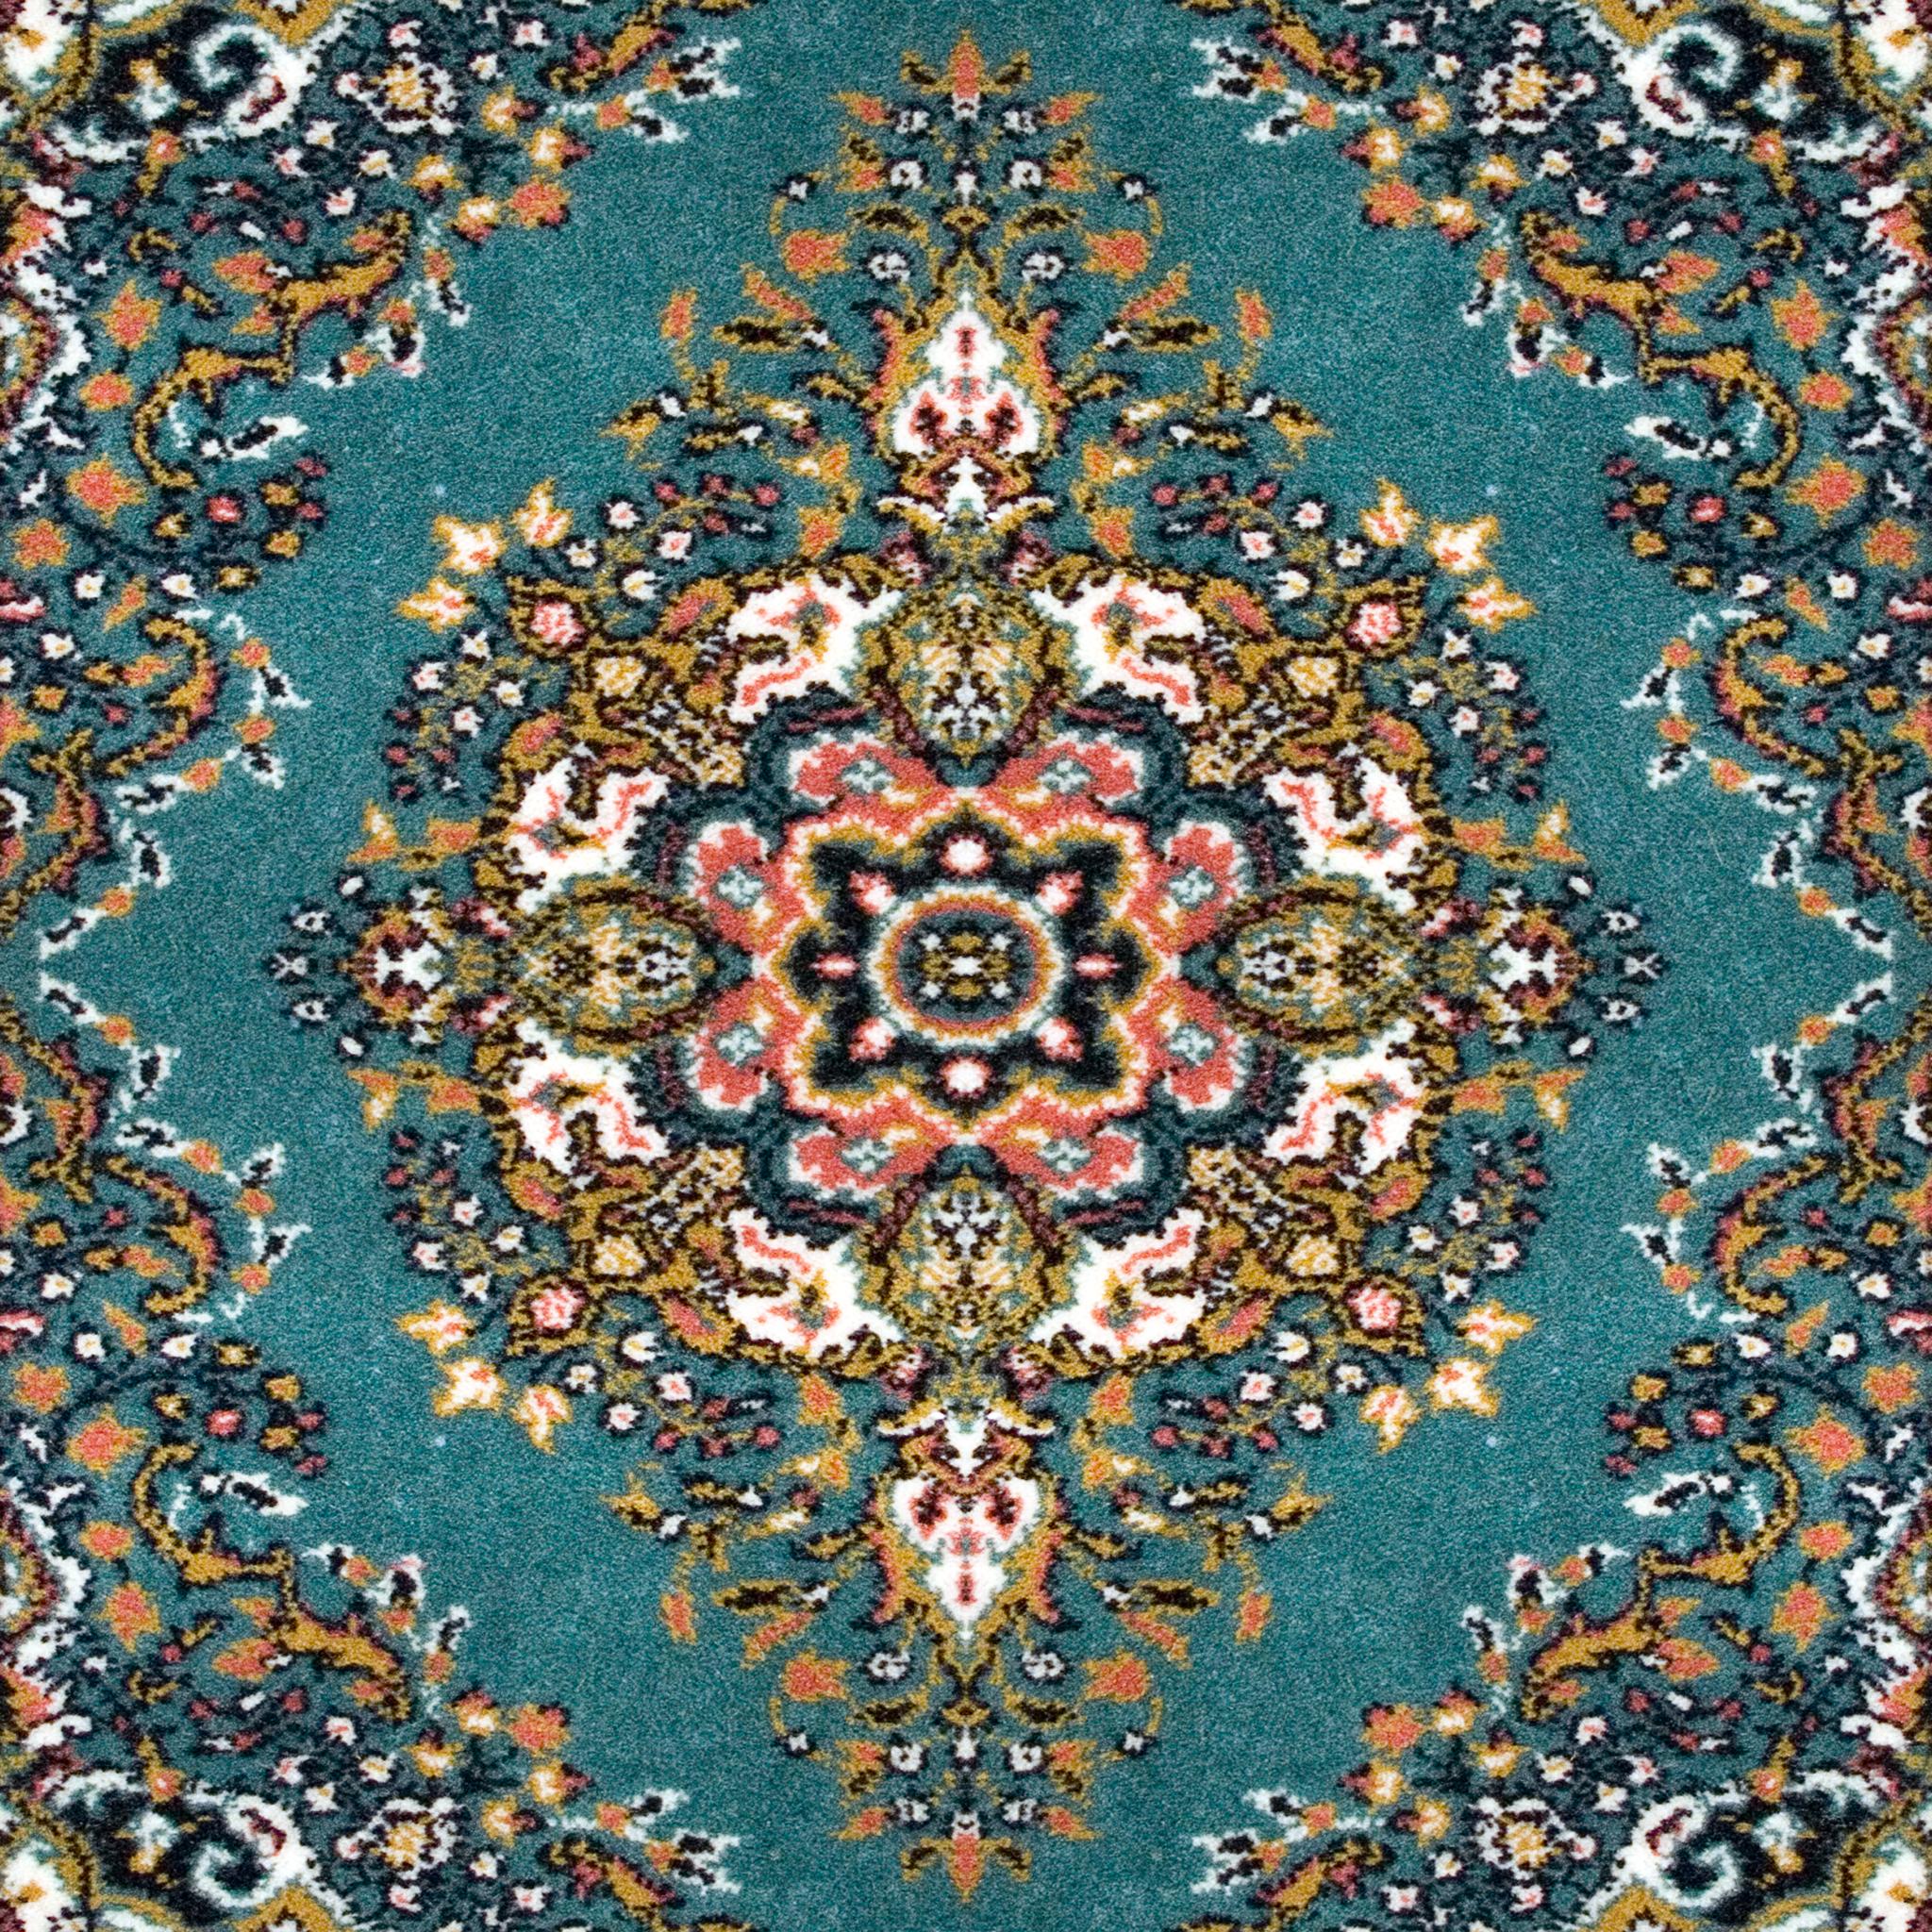 Aqua Blue Carpet.jpg